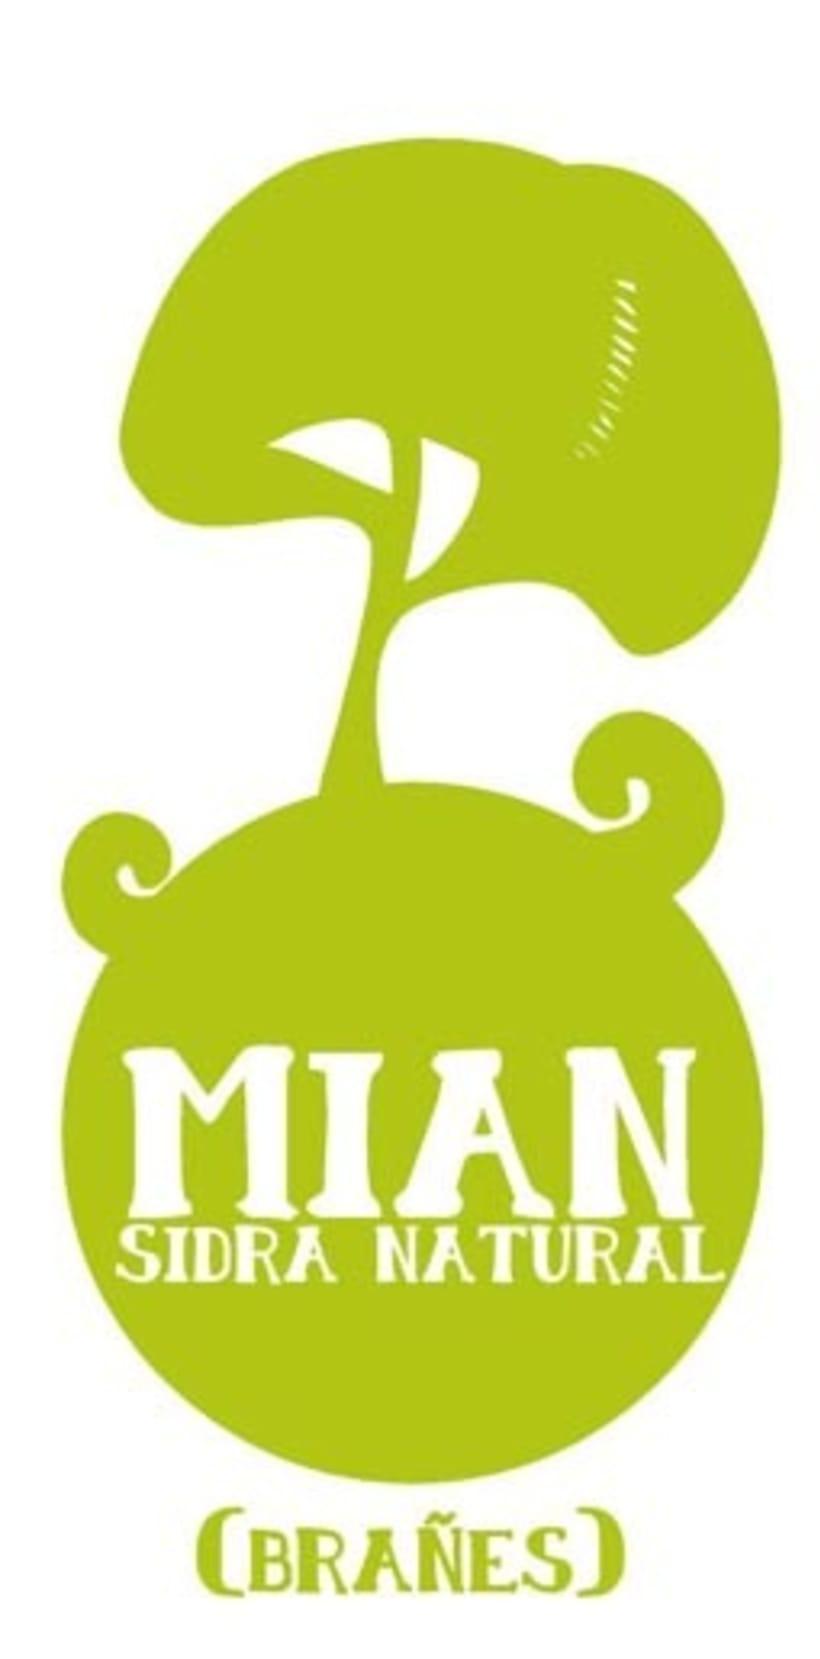 Etiqueta para sidra MiaN 1